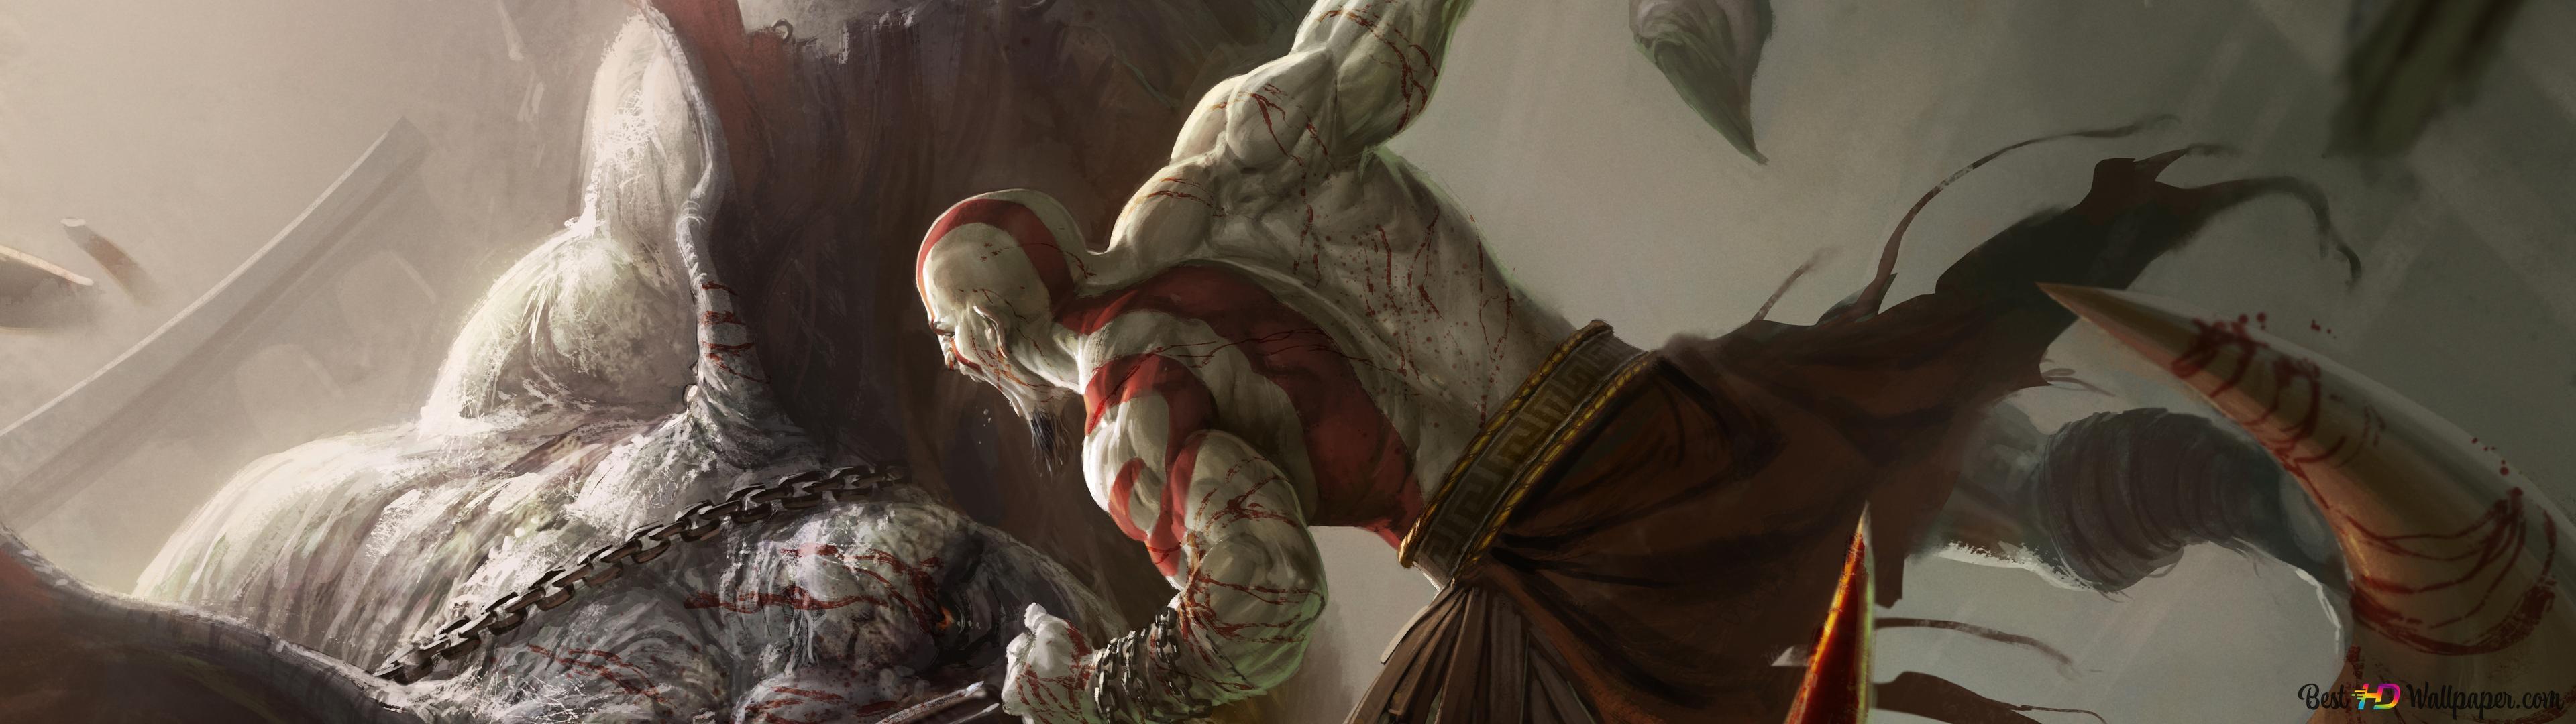 Descargar Fondo De Pantalla God Of War Ascension Kratos Hd